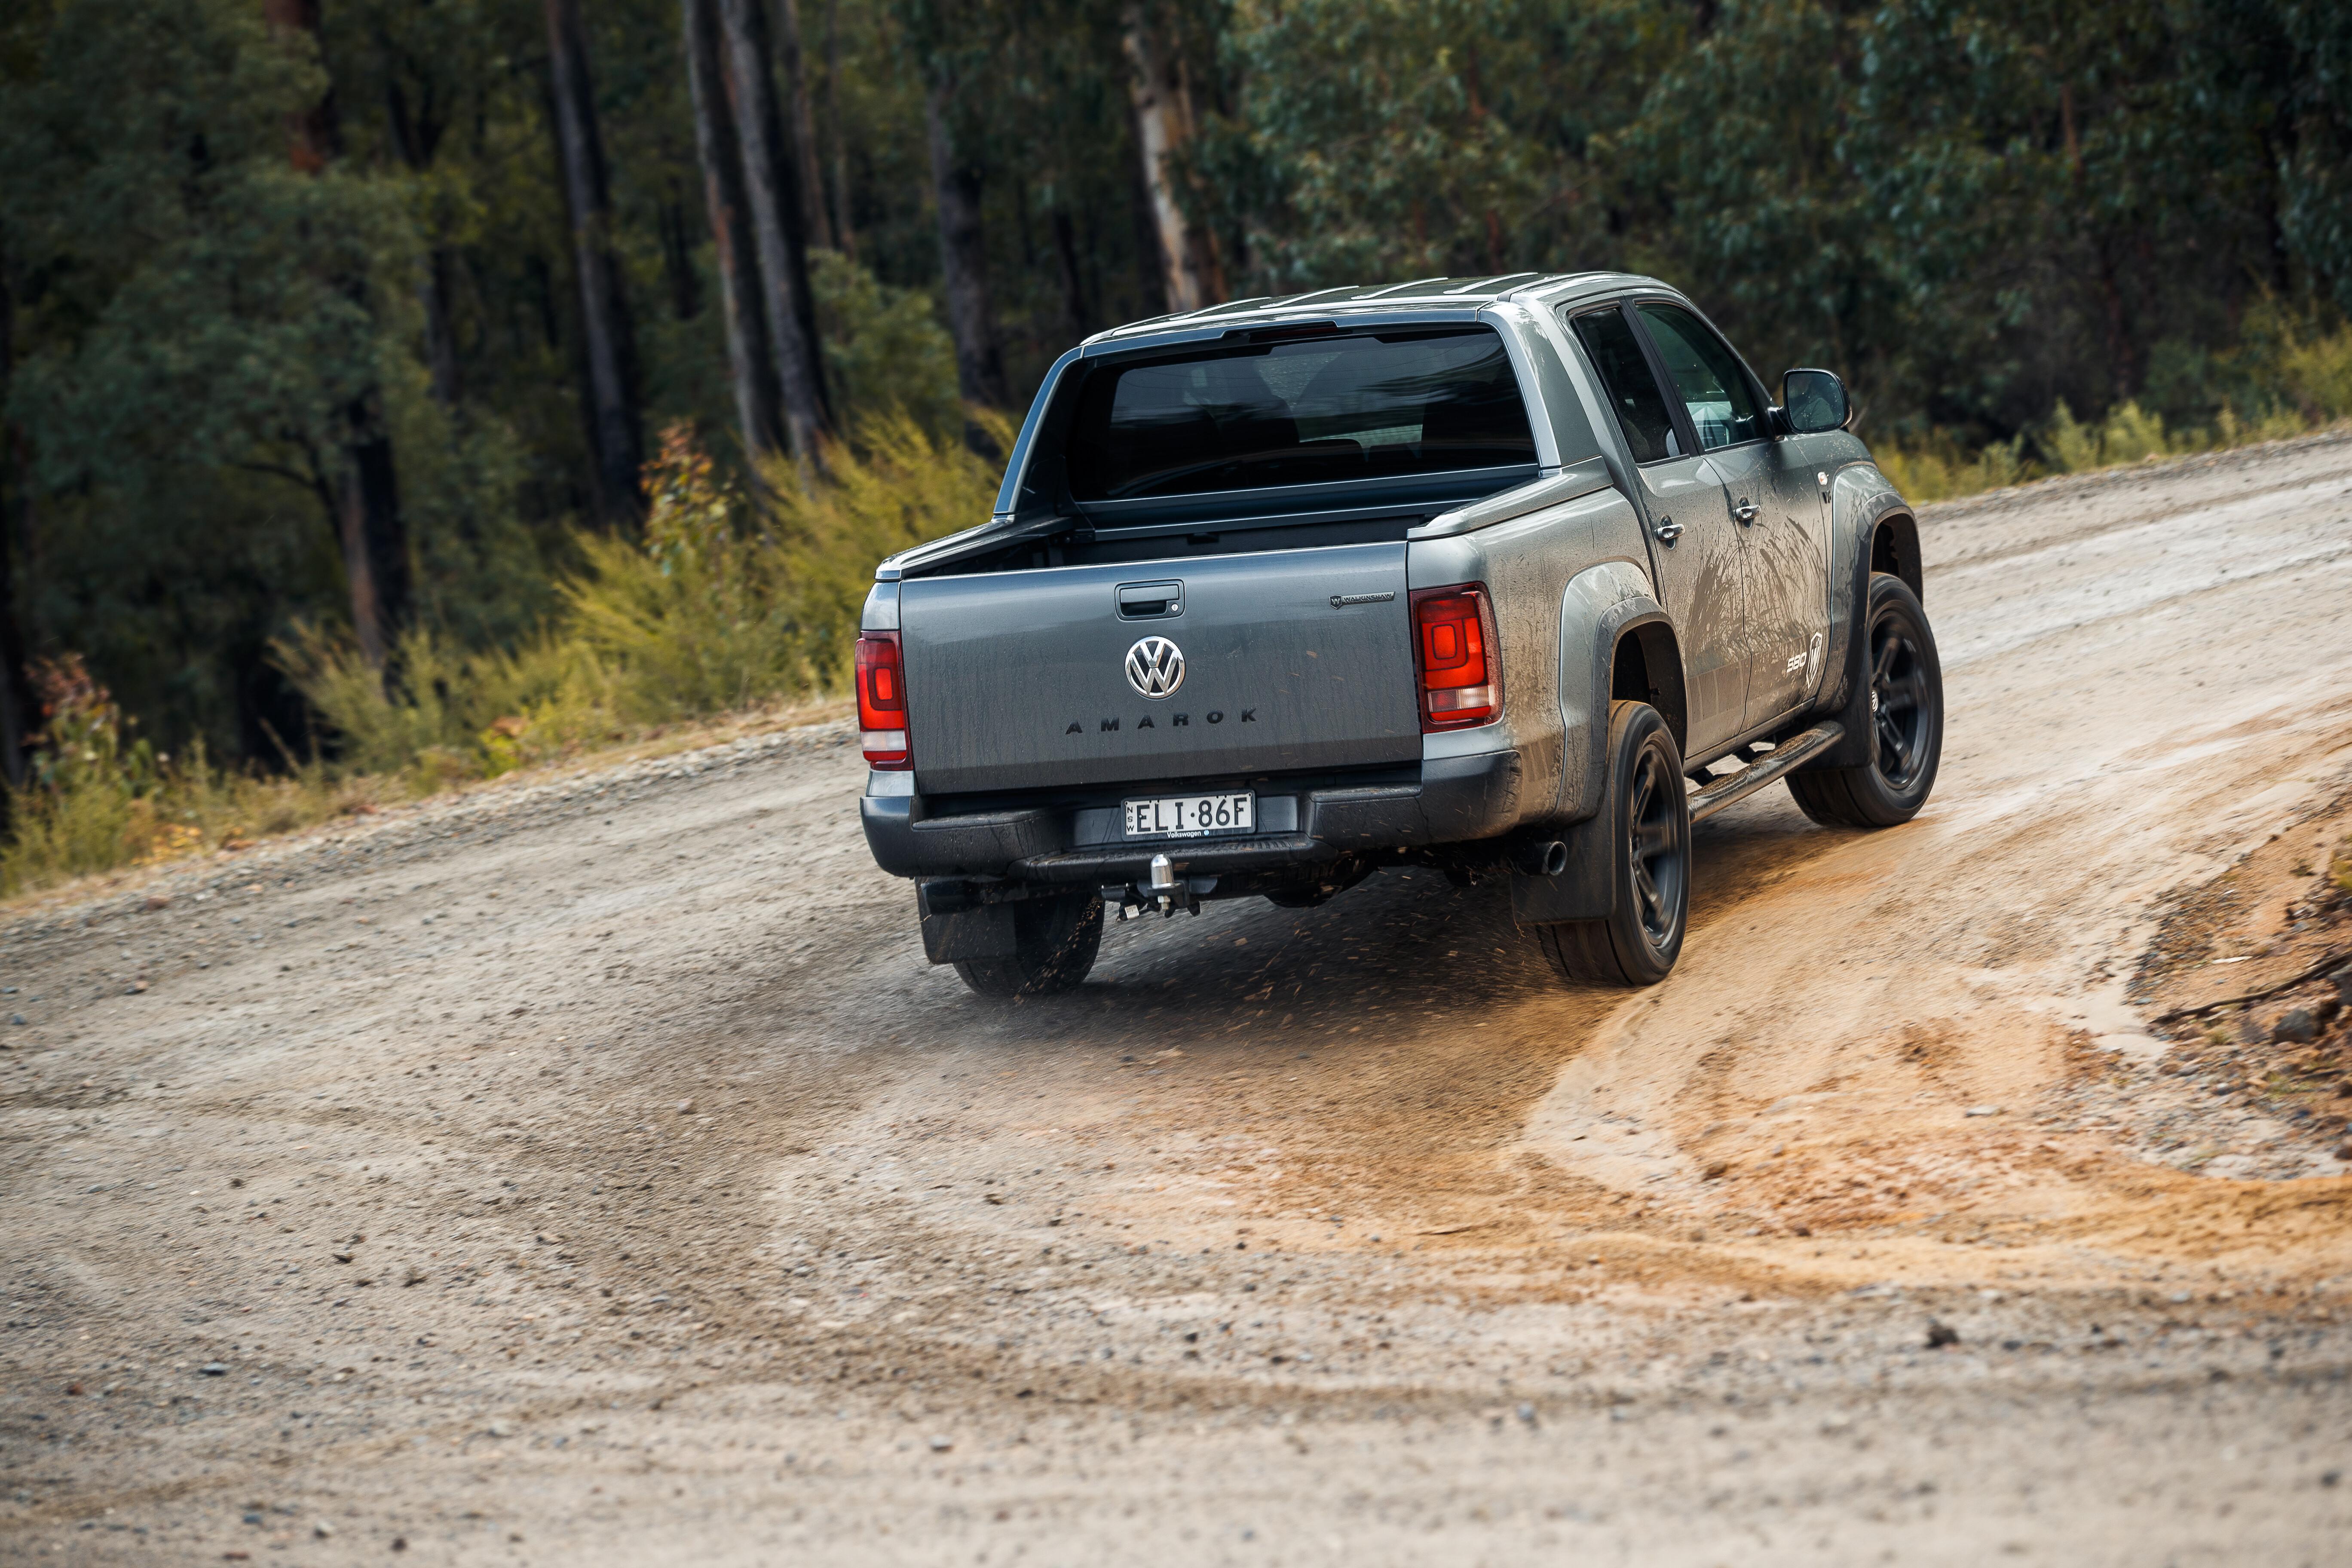 4 X 4 Australia Reviews 2021 July 2021 2021 Volkswagen Amarok W 580 S 19